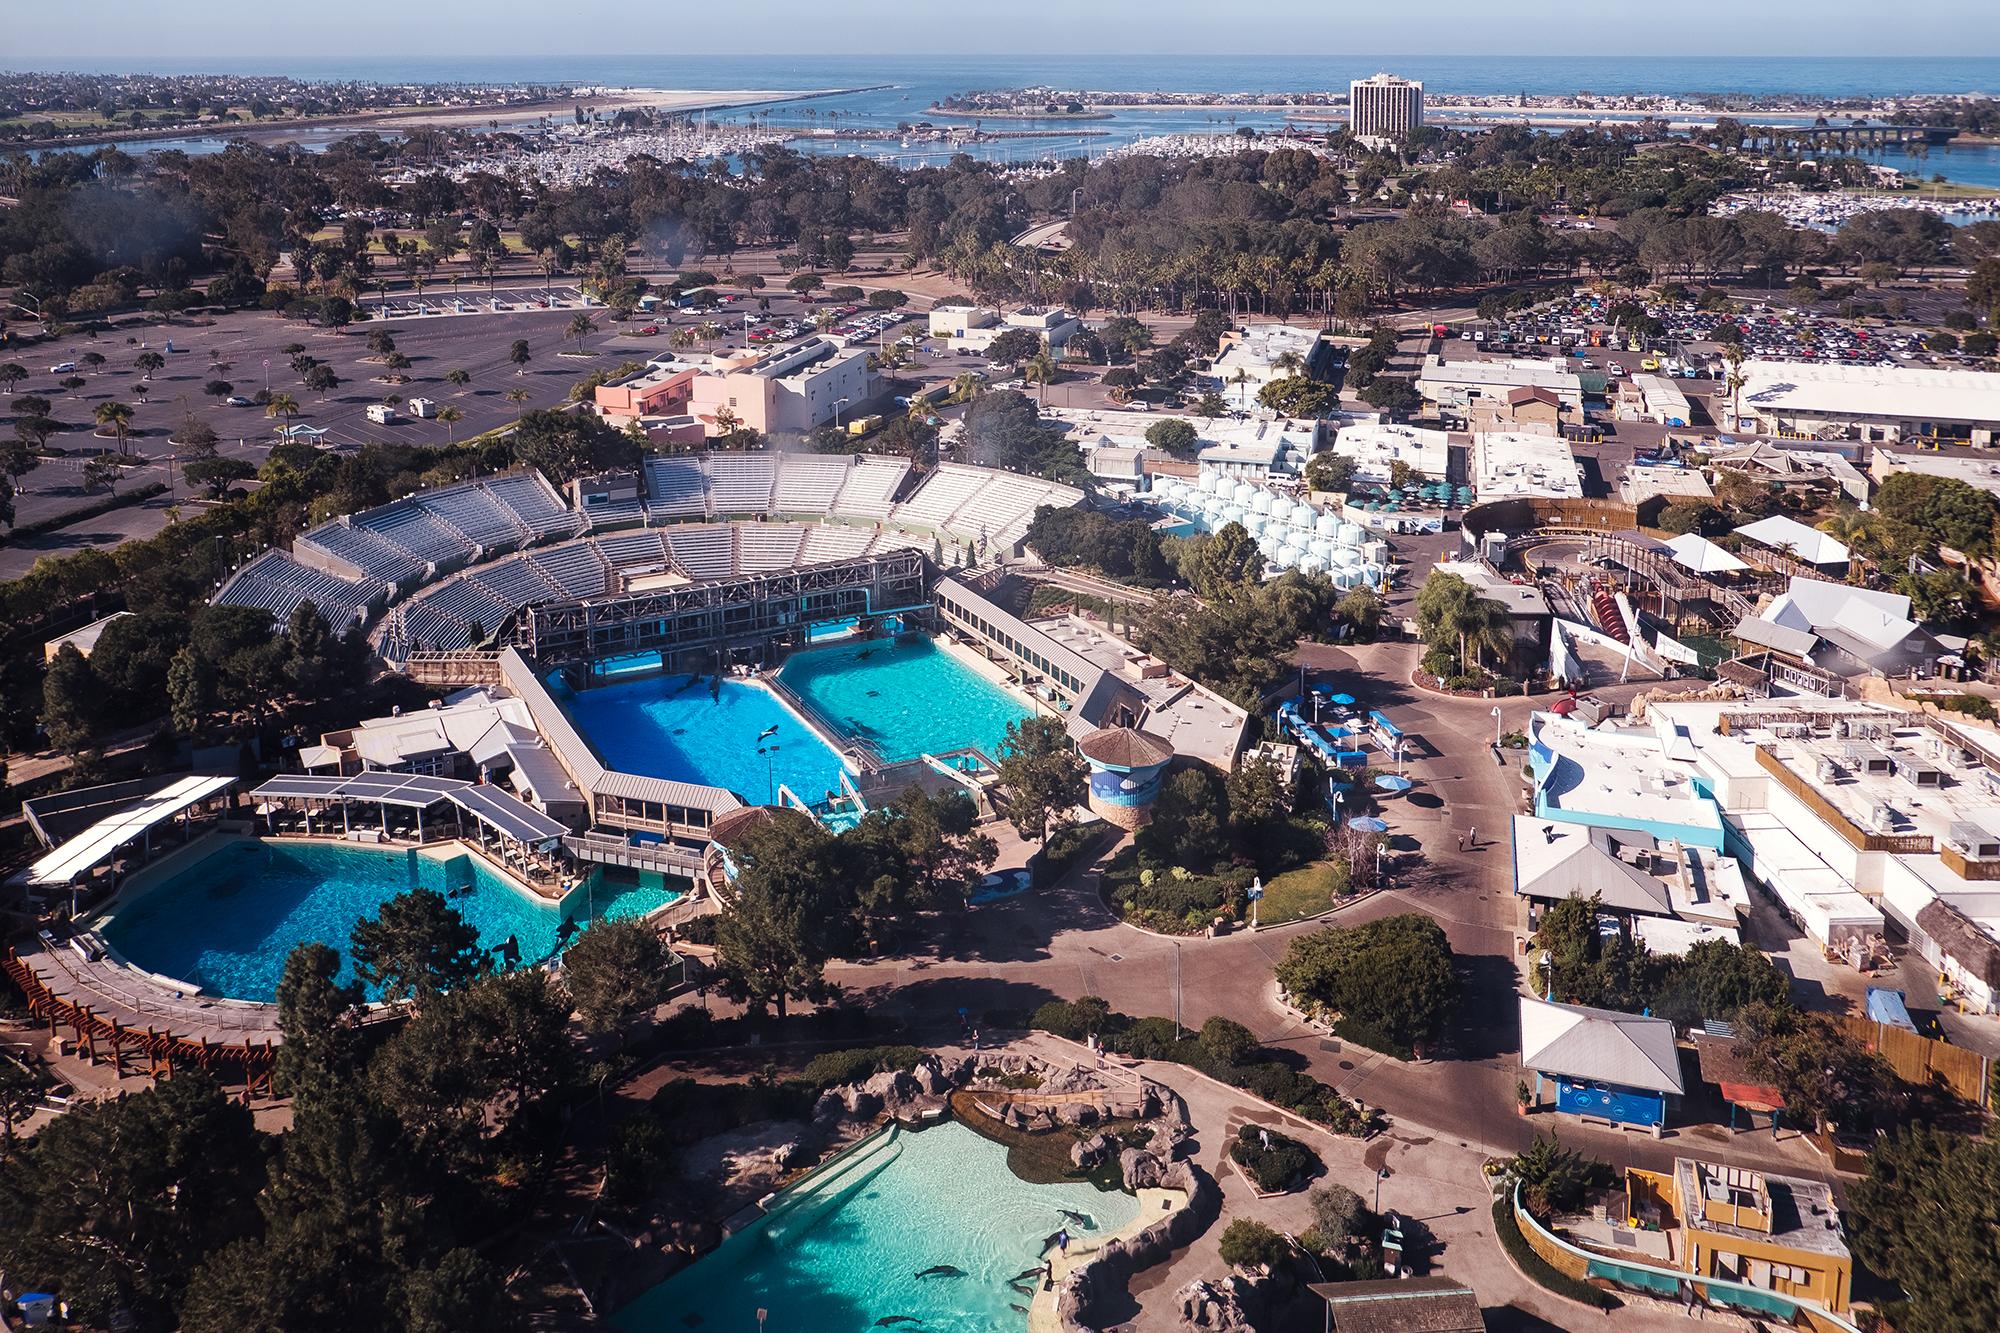 San Diego 2017-393 resize.jpg